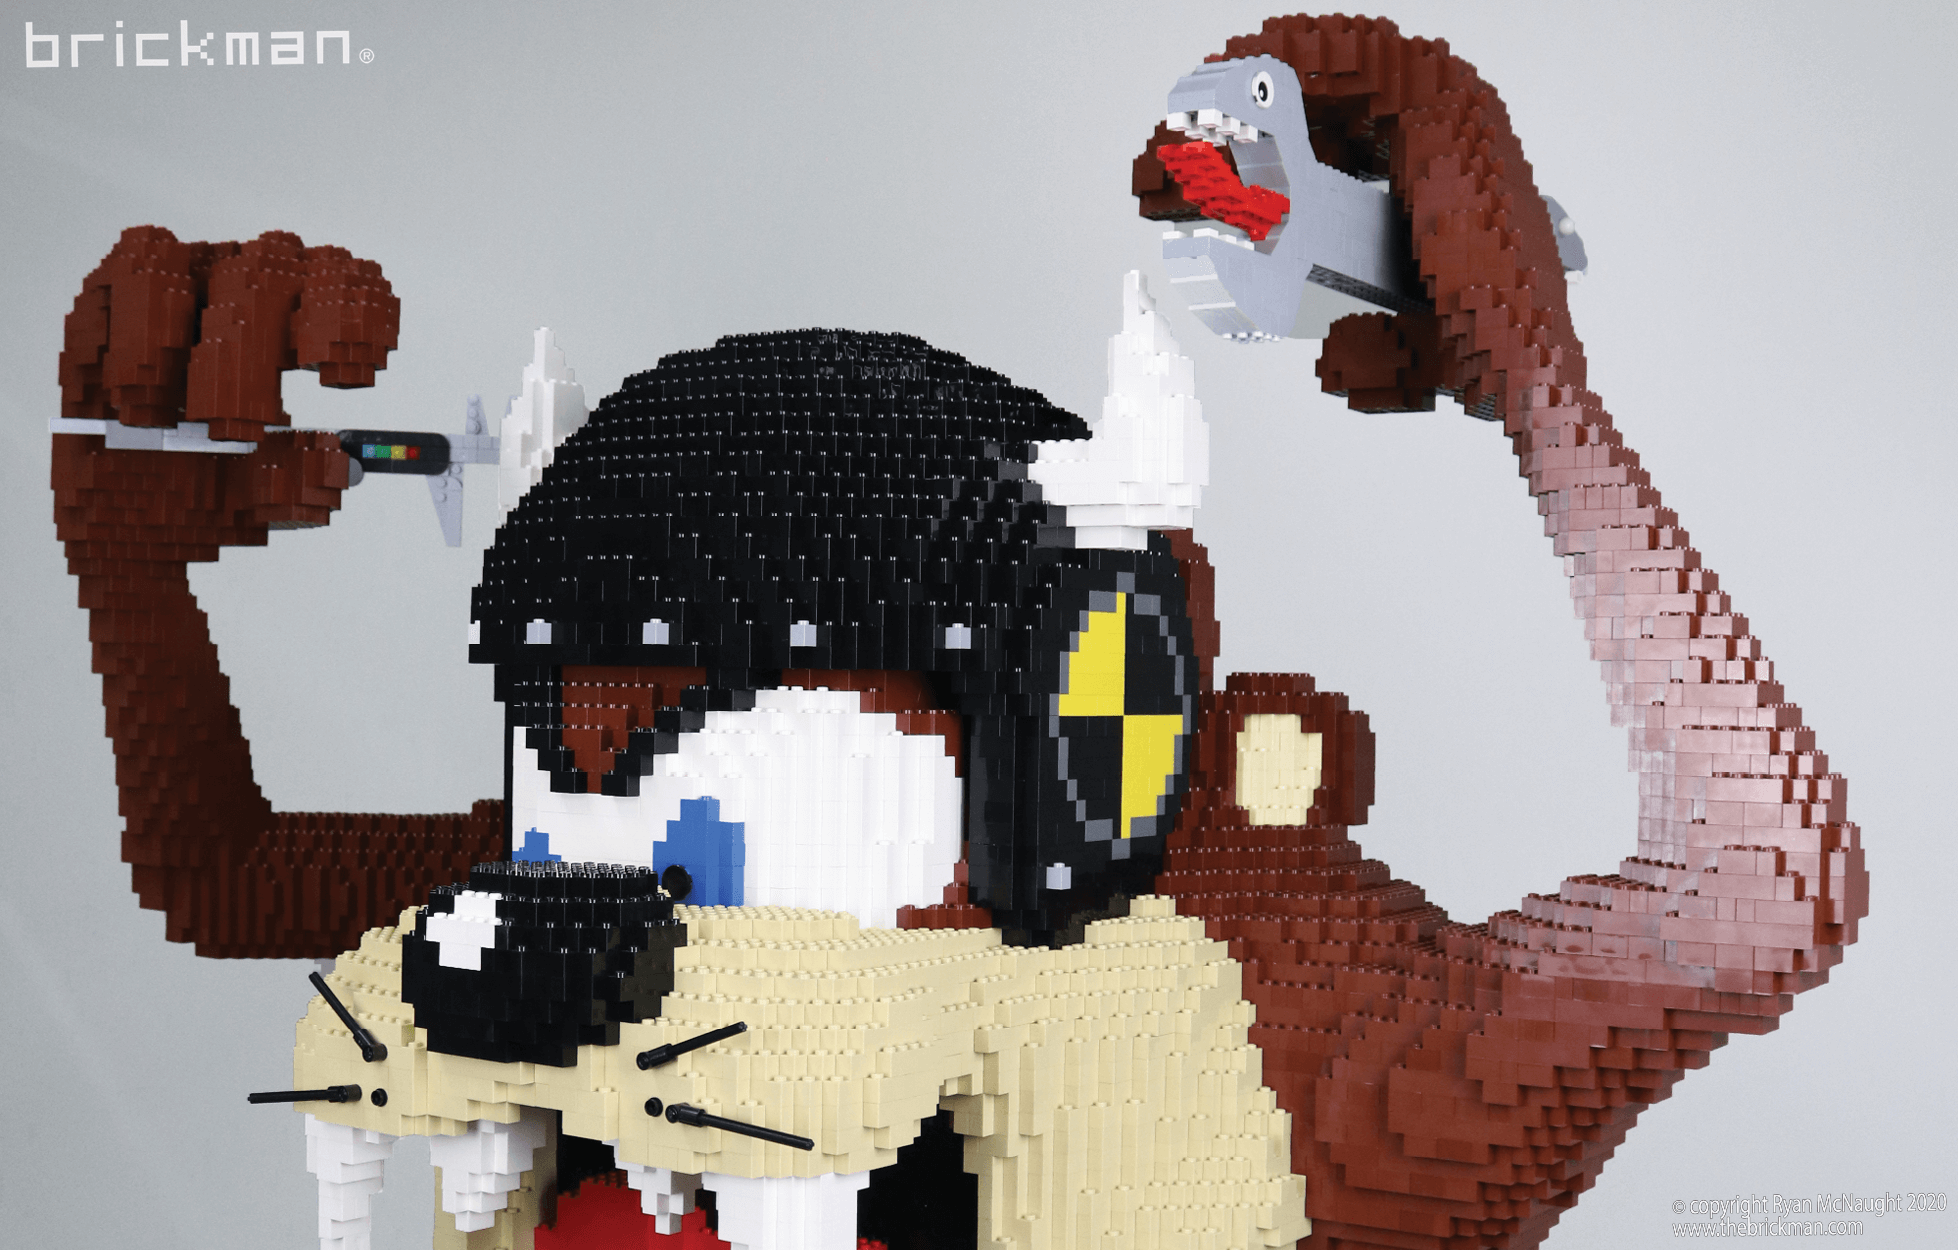 LEGO brick Taz Devil Cash Test Dummy